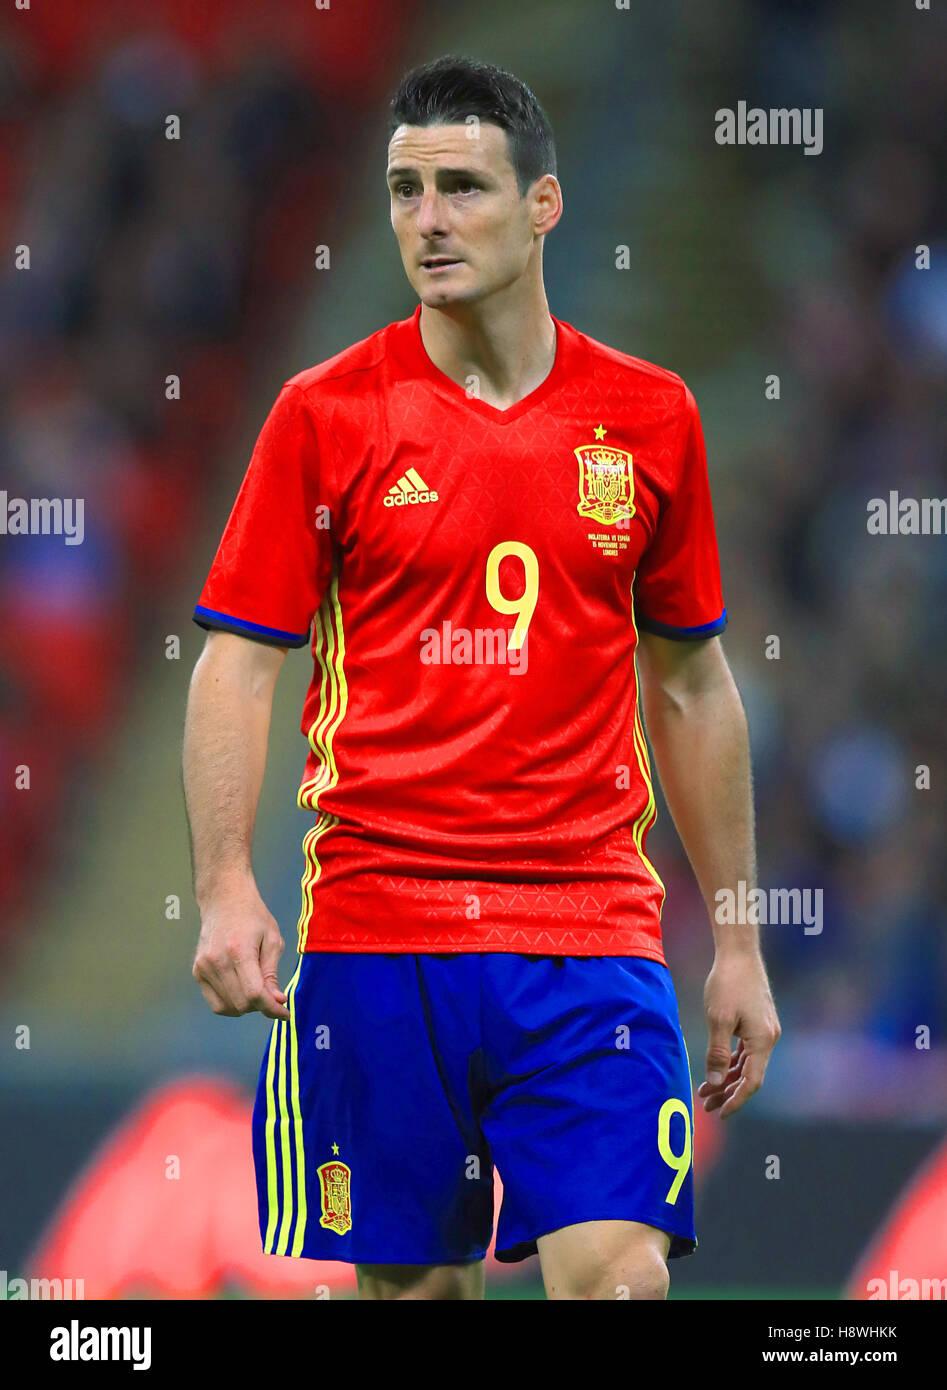 Aritz Aduriz Spain Stock Royalty Free Image Alamy